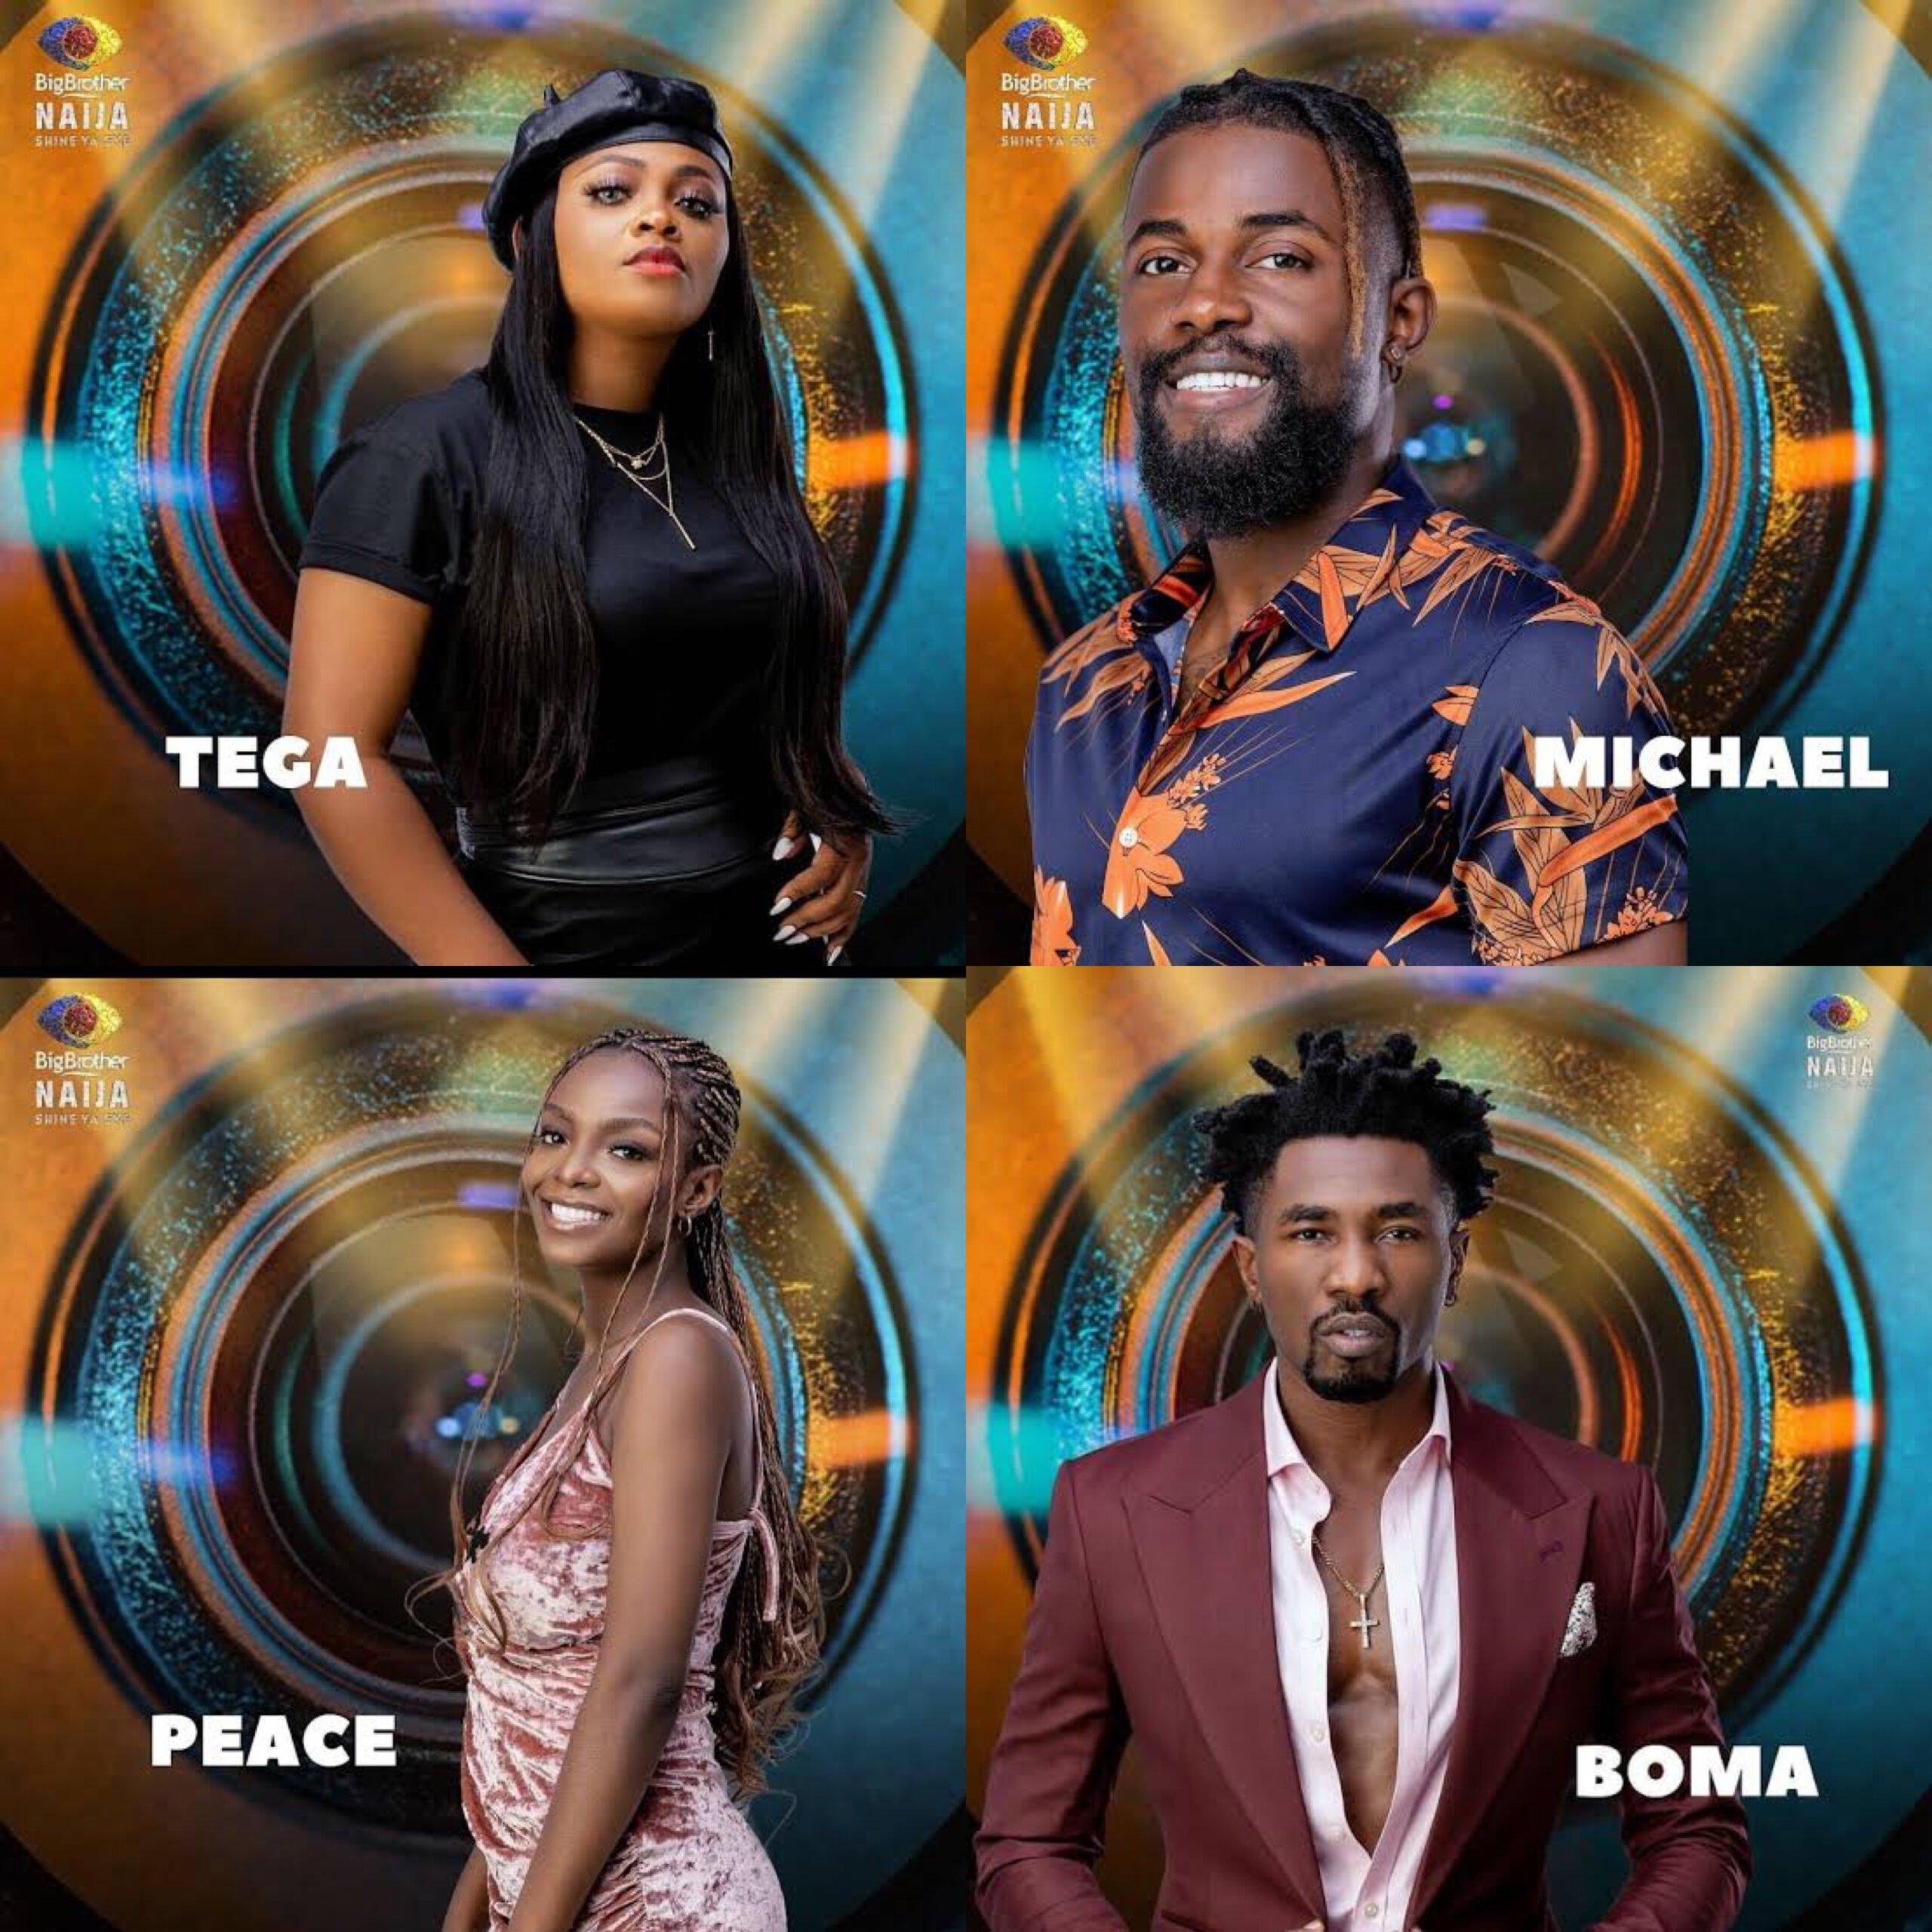 BBNaija: Boma, Tega, Michael, Peace pitch housemates to win grand prize